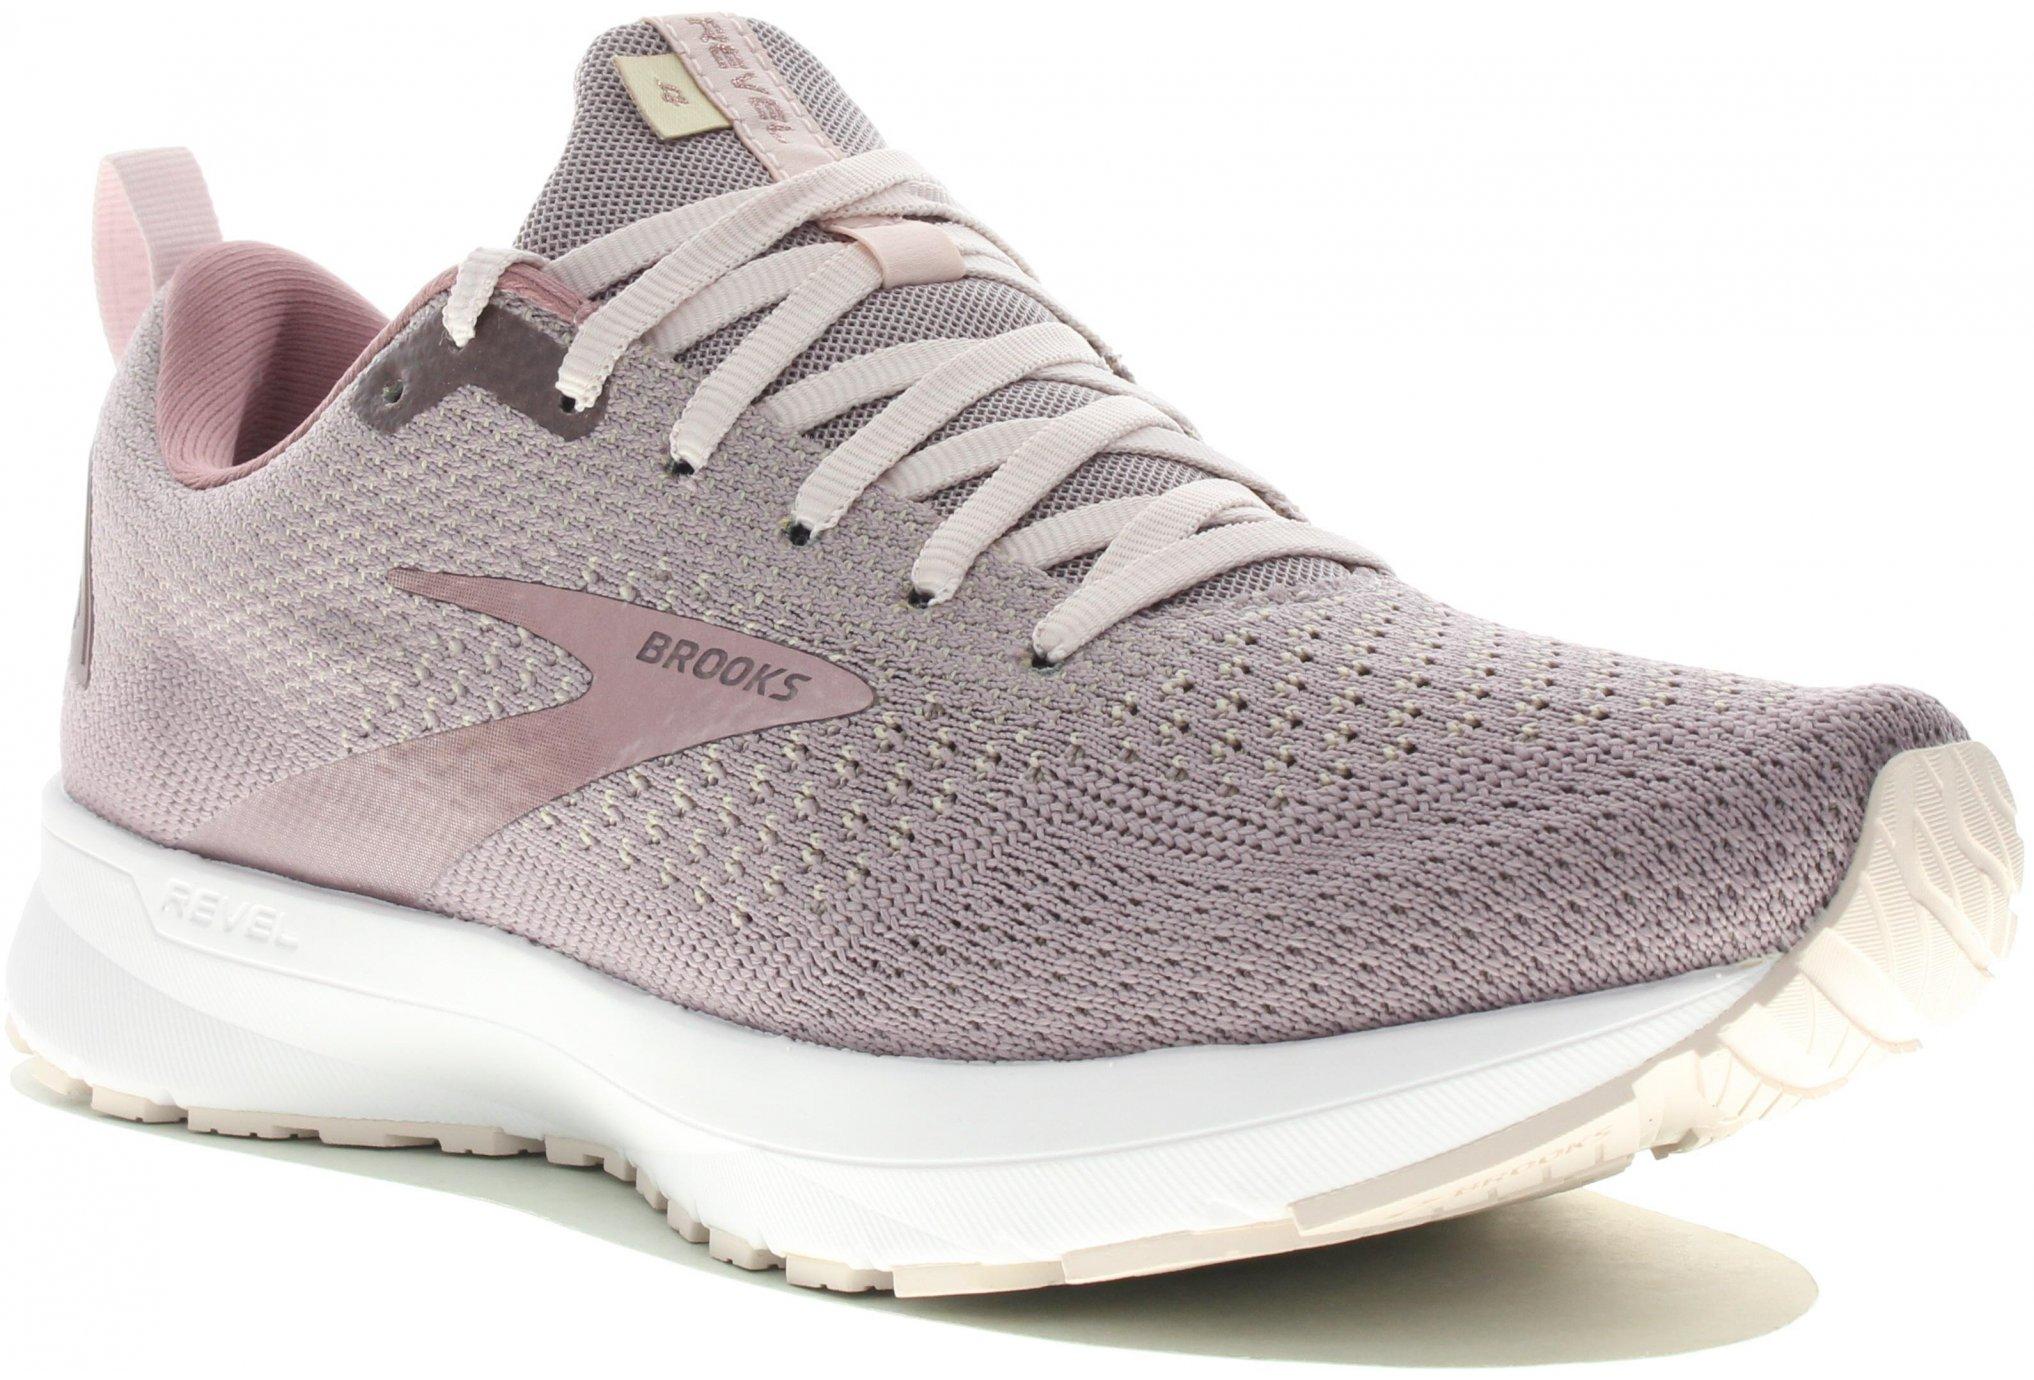 Brooks Revel 4 W Chaussures running femme